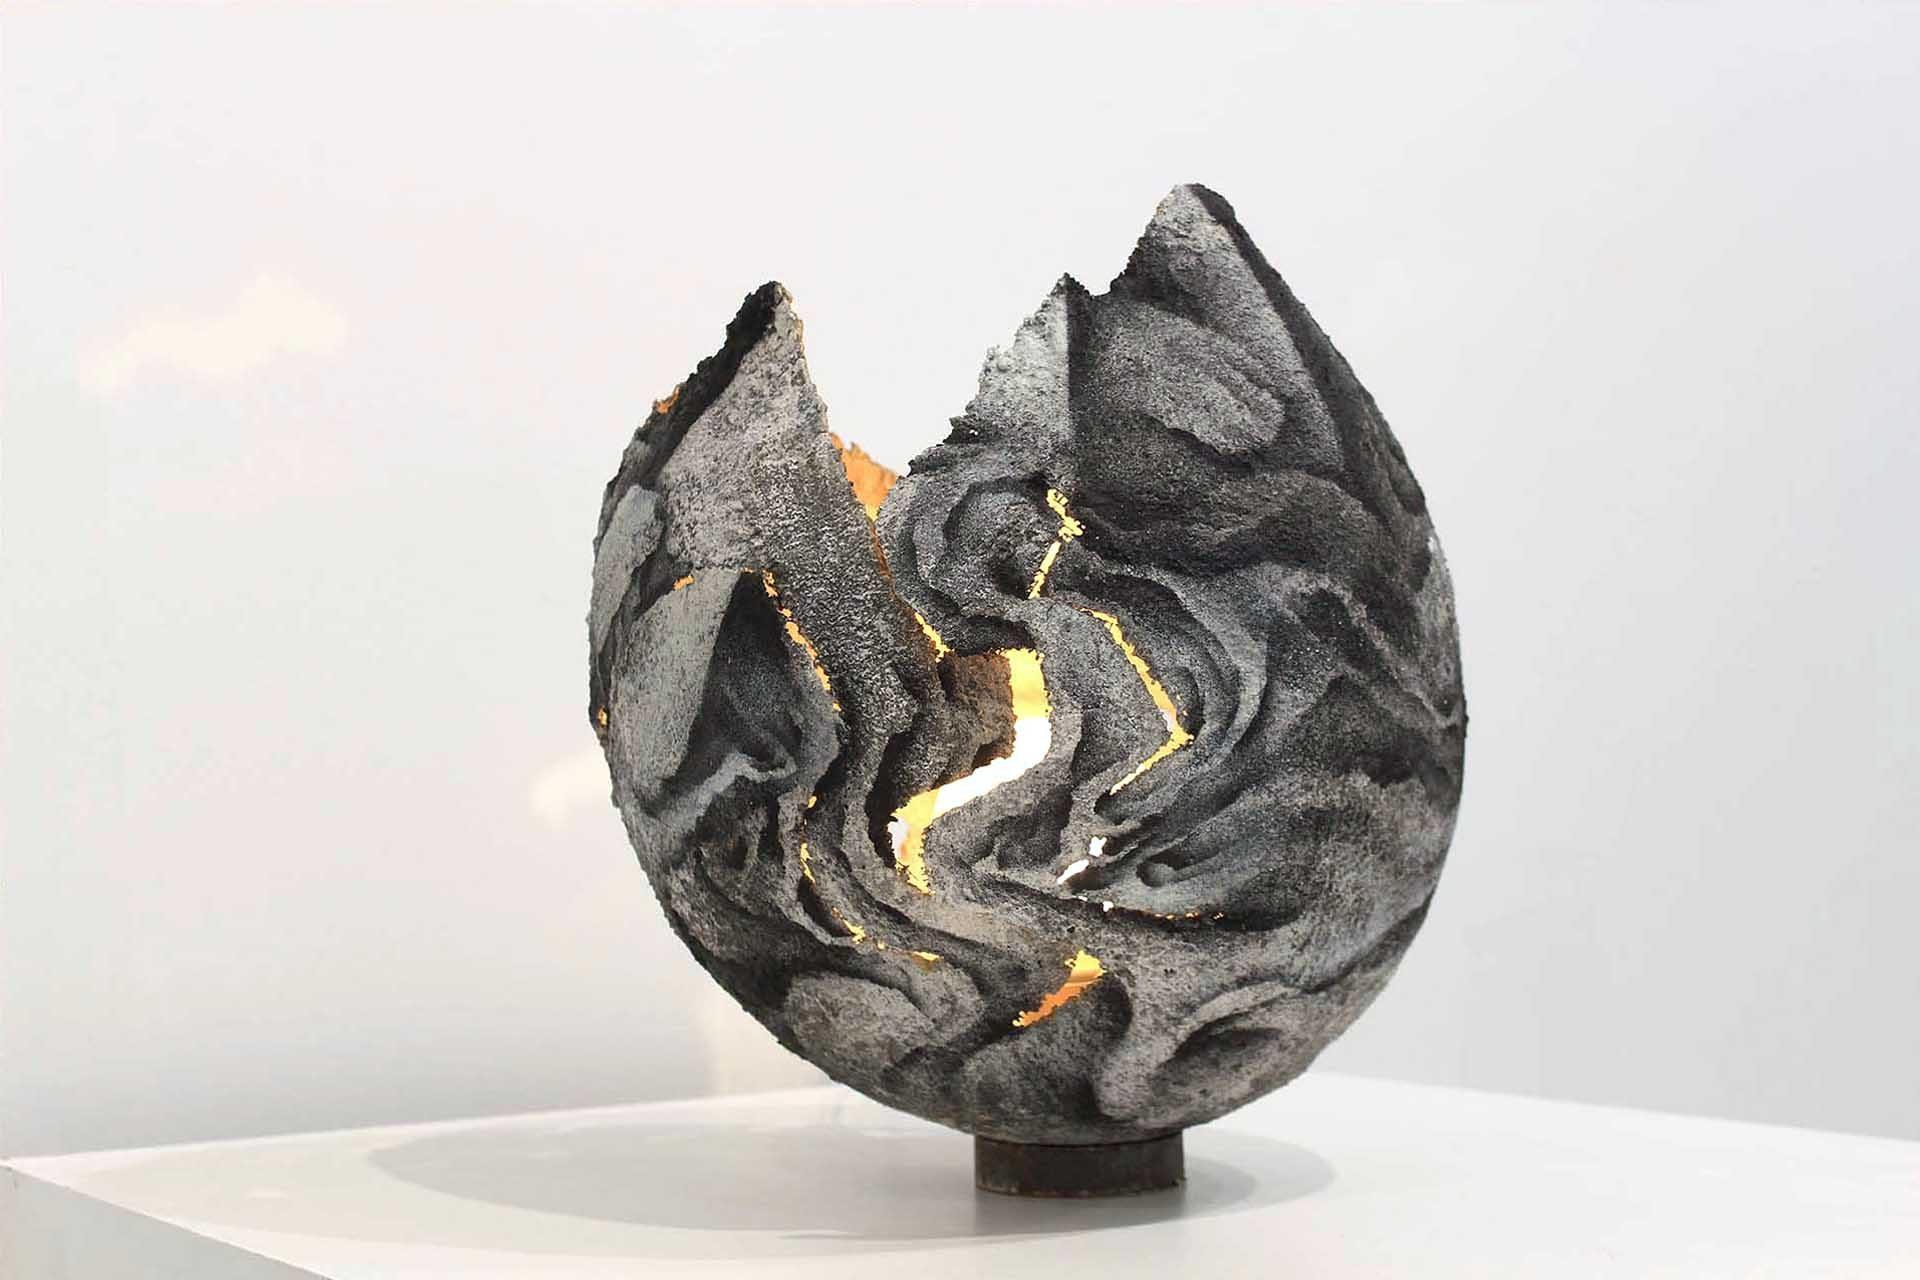 roubens-sanzache-contemporary-abstract-organic-vegetal-dynamic-art-graffiti-paint-sculpture-concrete-lighting-egg_25